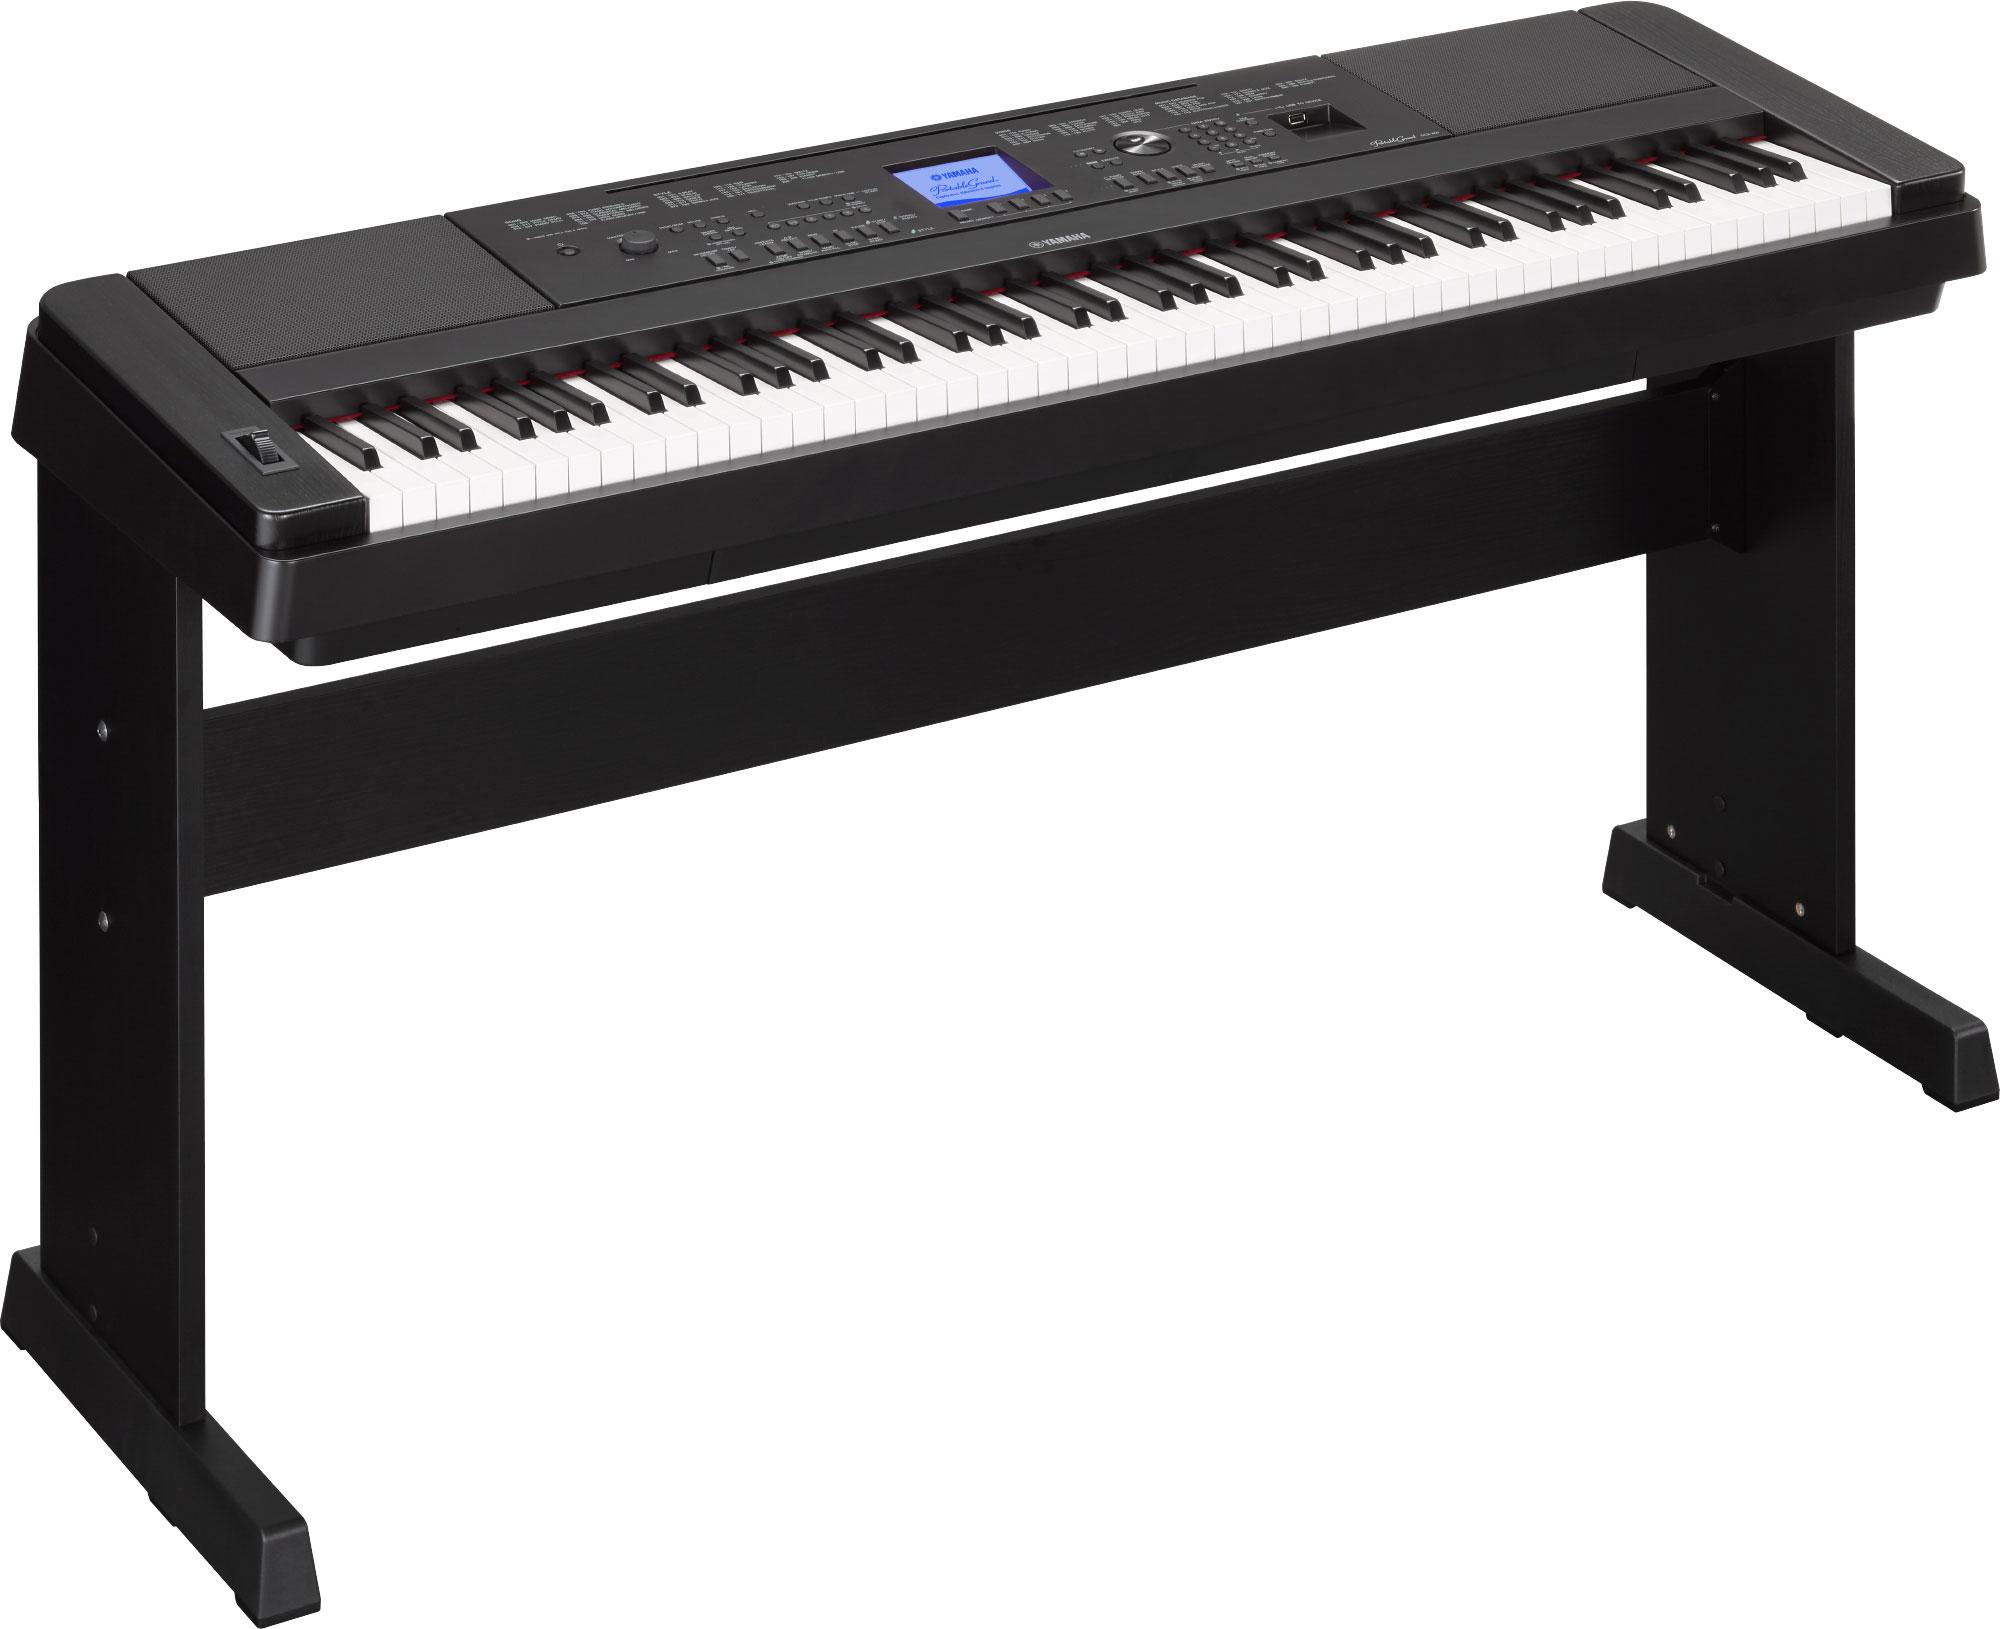 Yamaha DGX-660 Digital Piano - Black